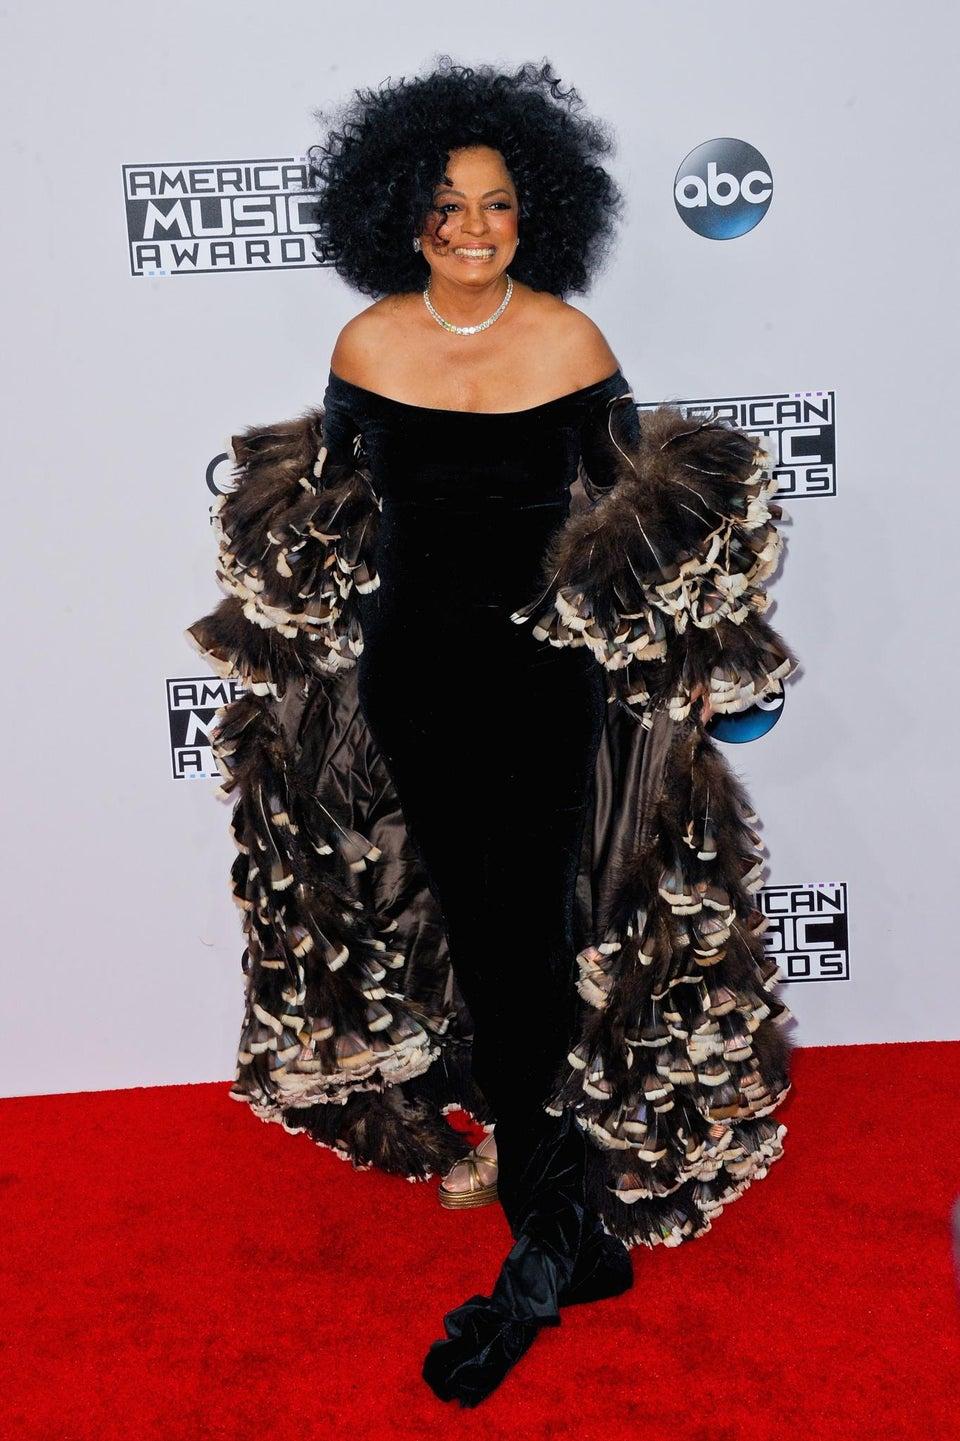 Diana Ross Set to Begin Mini-Residency in Las Vegas